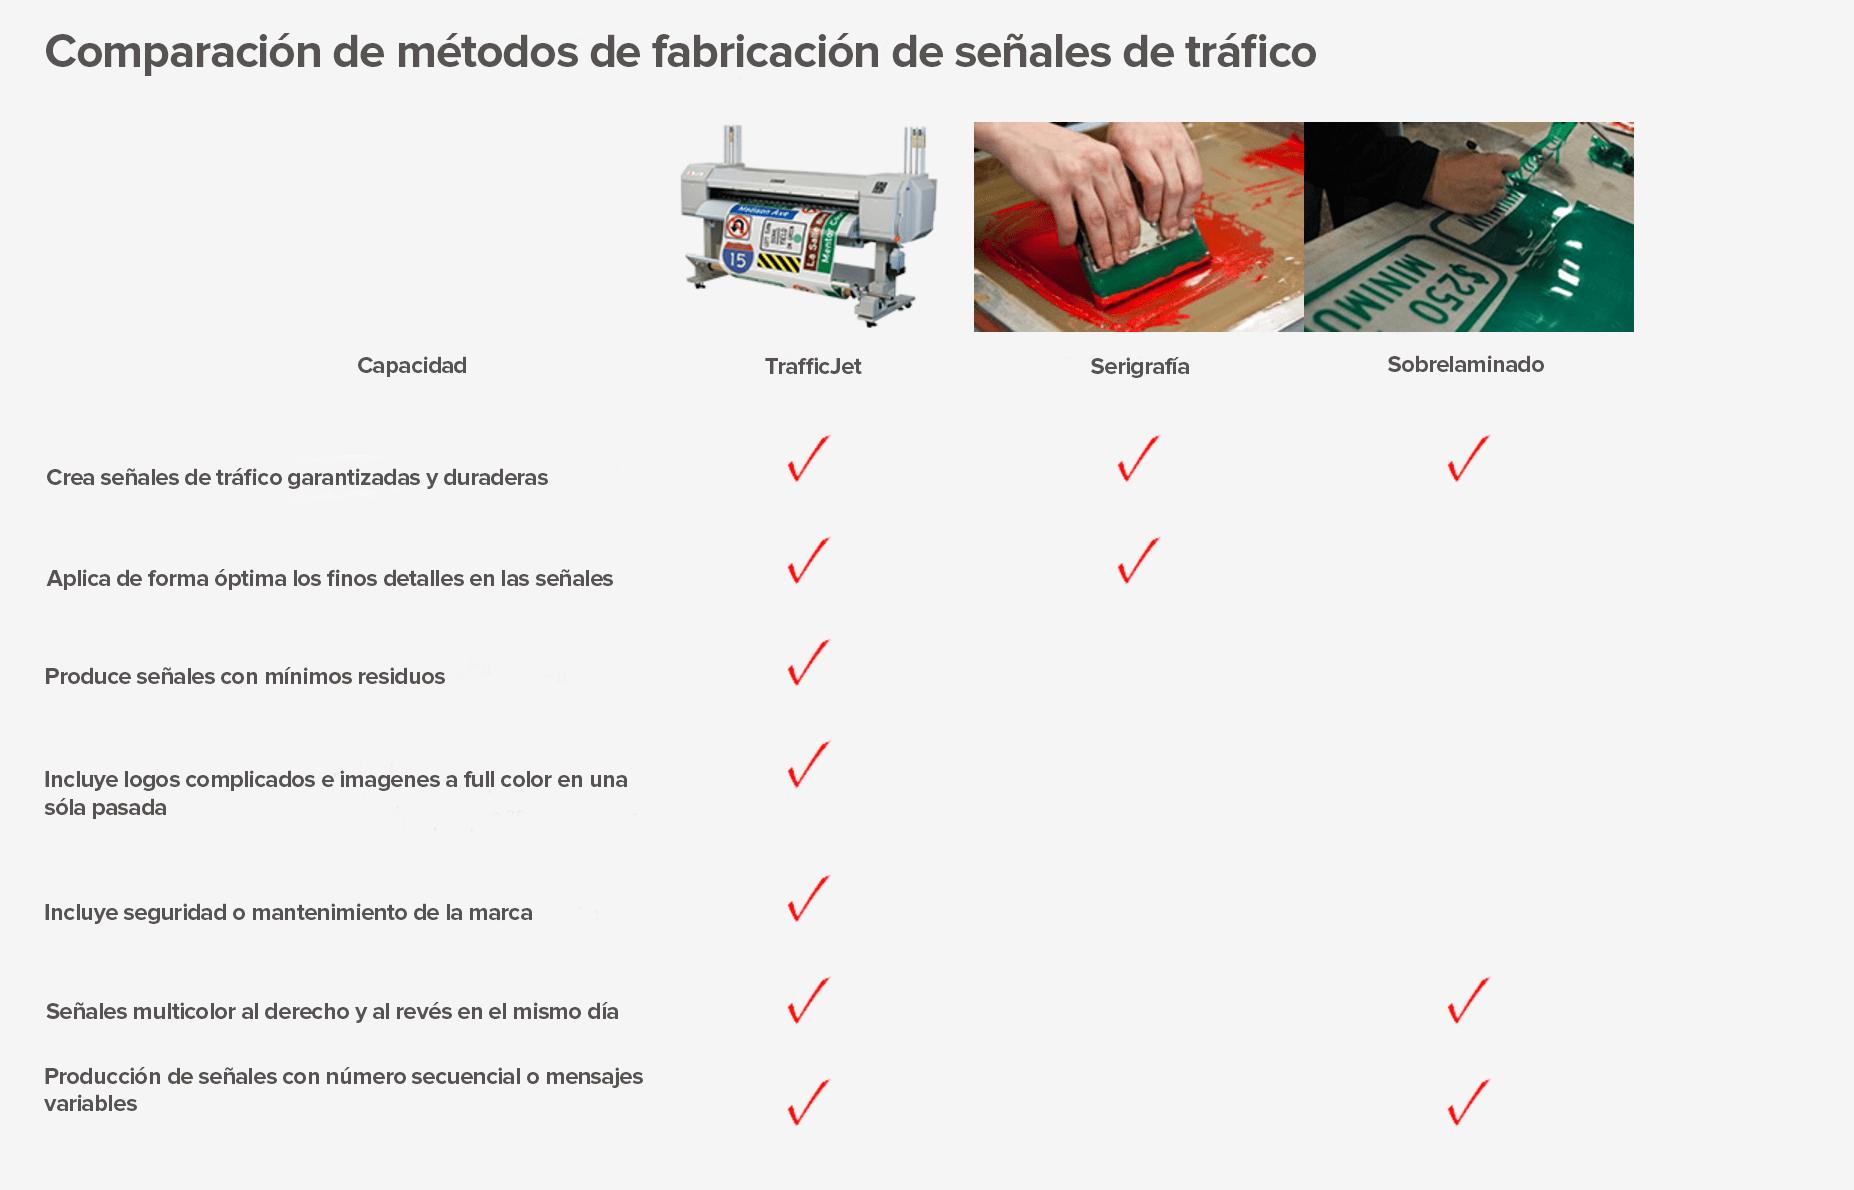 Impresora para señales de tráfico TrafficJet